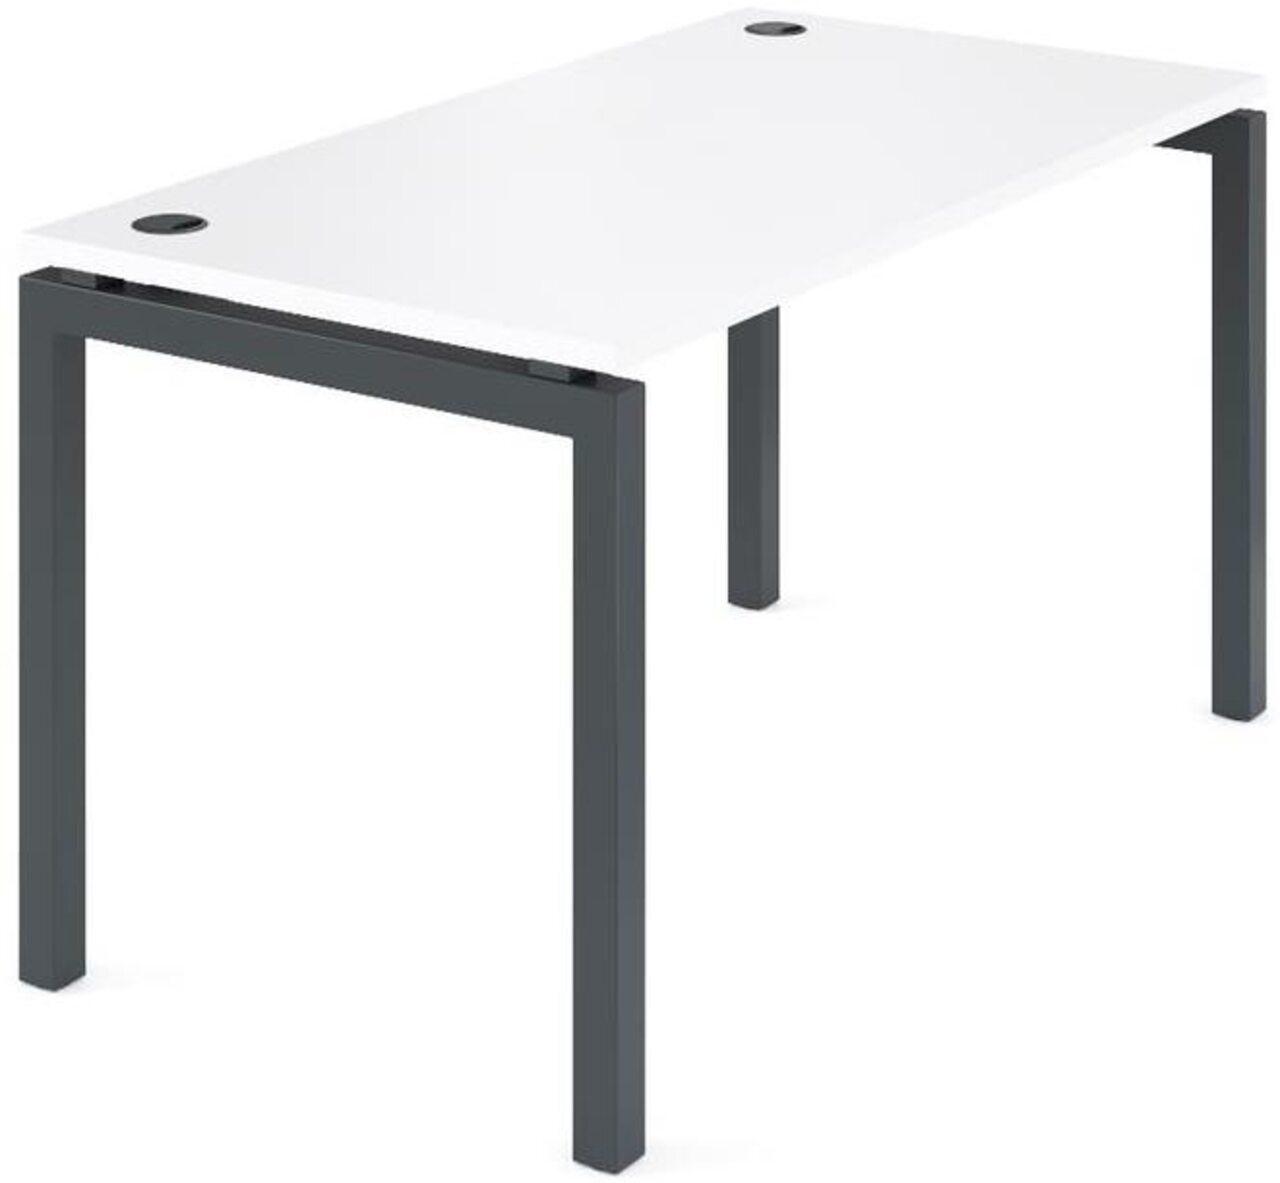 Стол на металлокаркасе  Арго 140x73x76 - фото 5